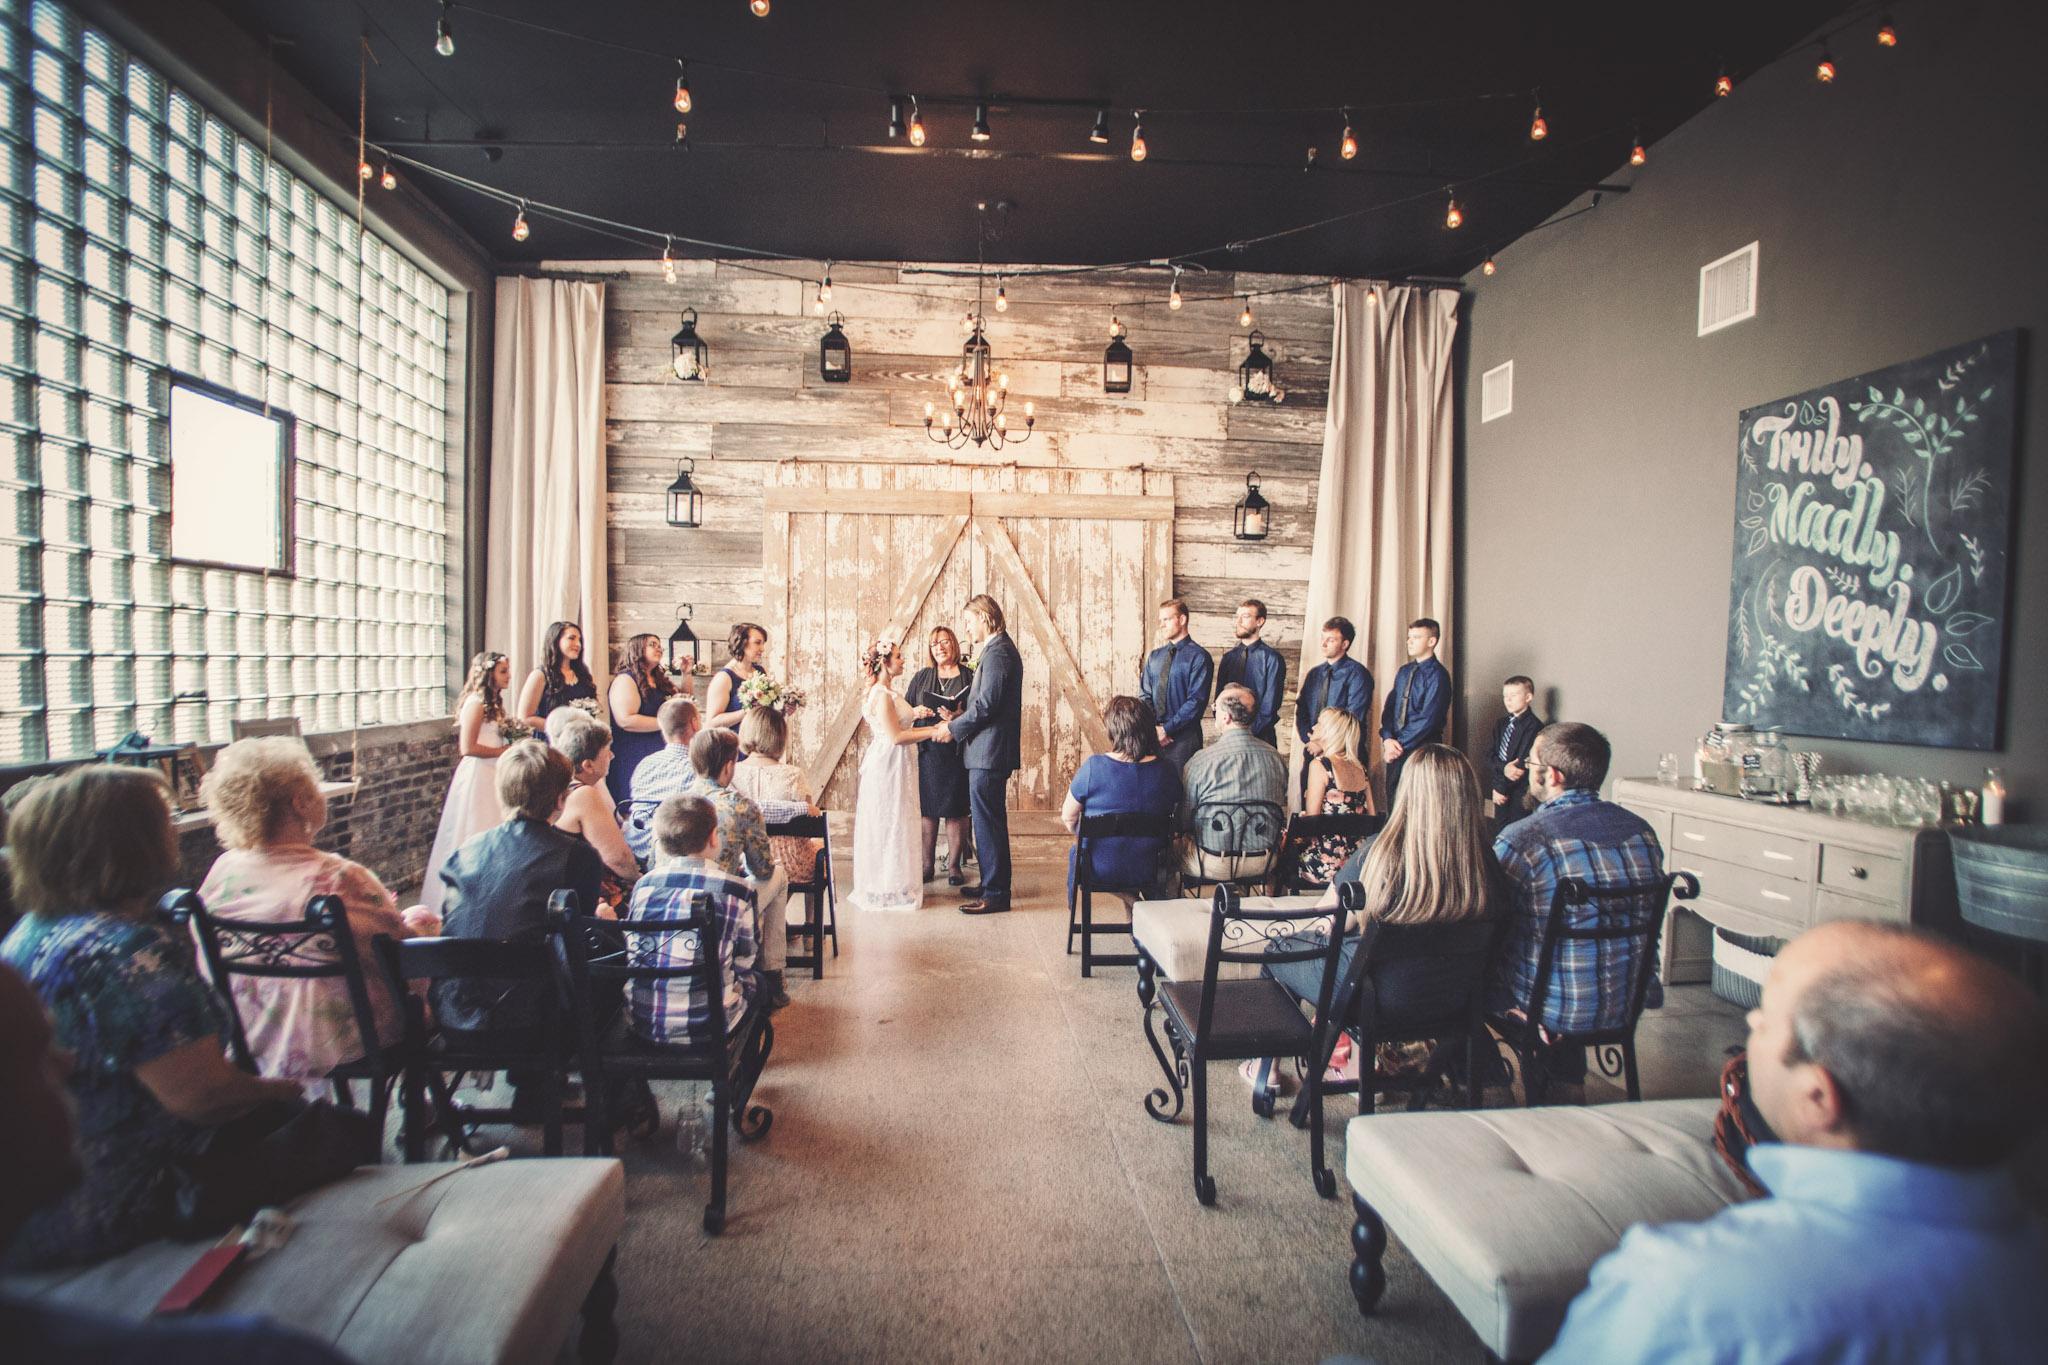 Kansas_City_Small_Wedding_Venue_Elope_Intimate_Ceremony_Budget_Affordable_Sophie&Philip_108b.jpg